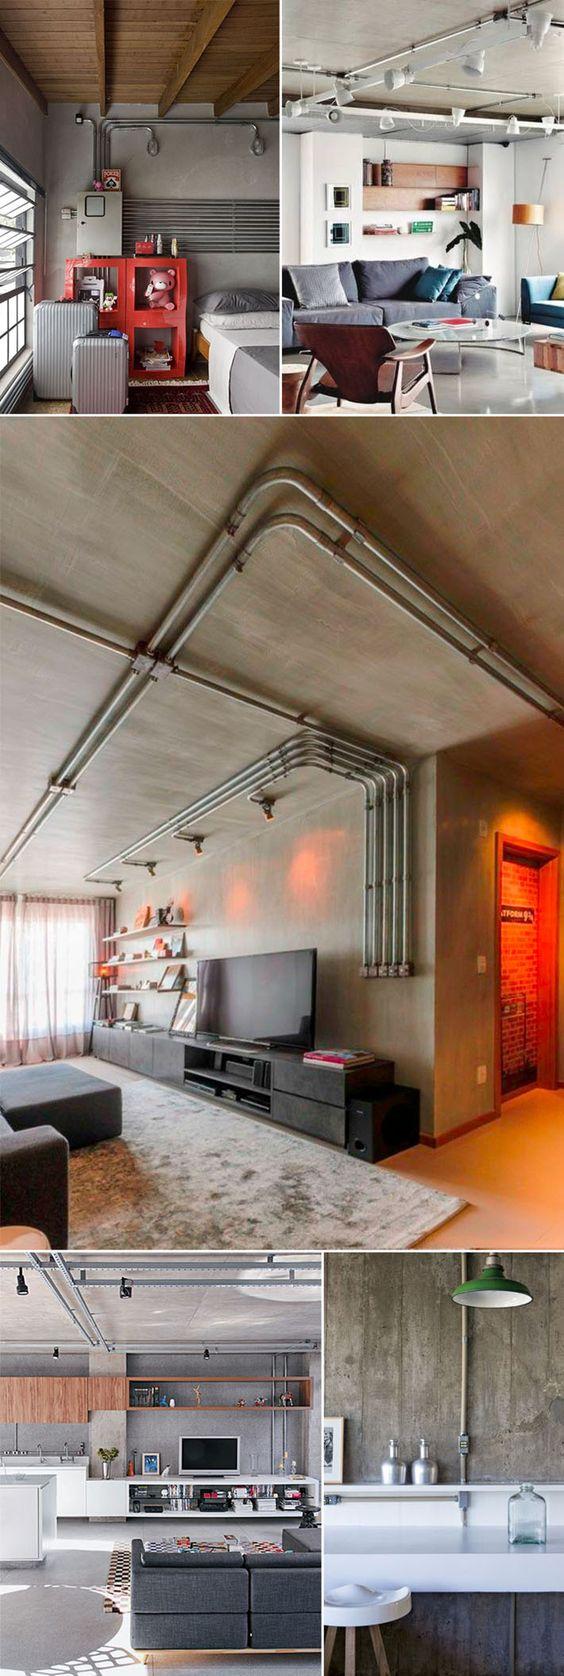 kwoooong technicolor pinterest industriel. Black Bedroom Furniture Sets. Home Design Ideas